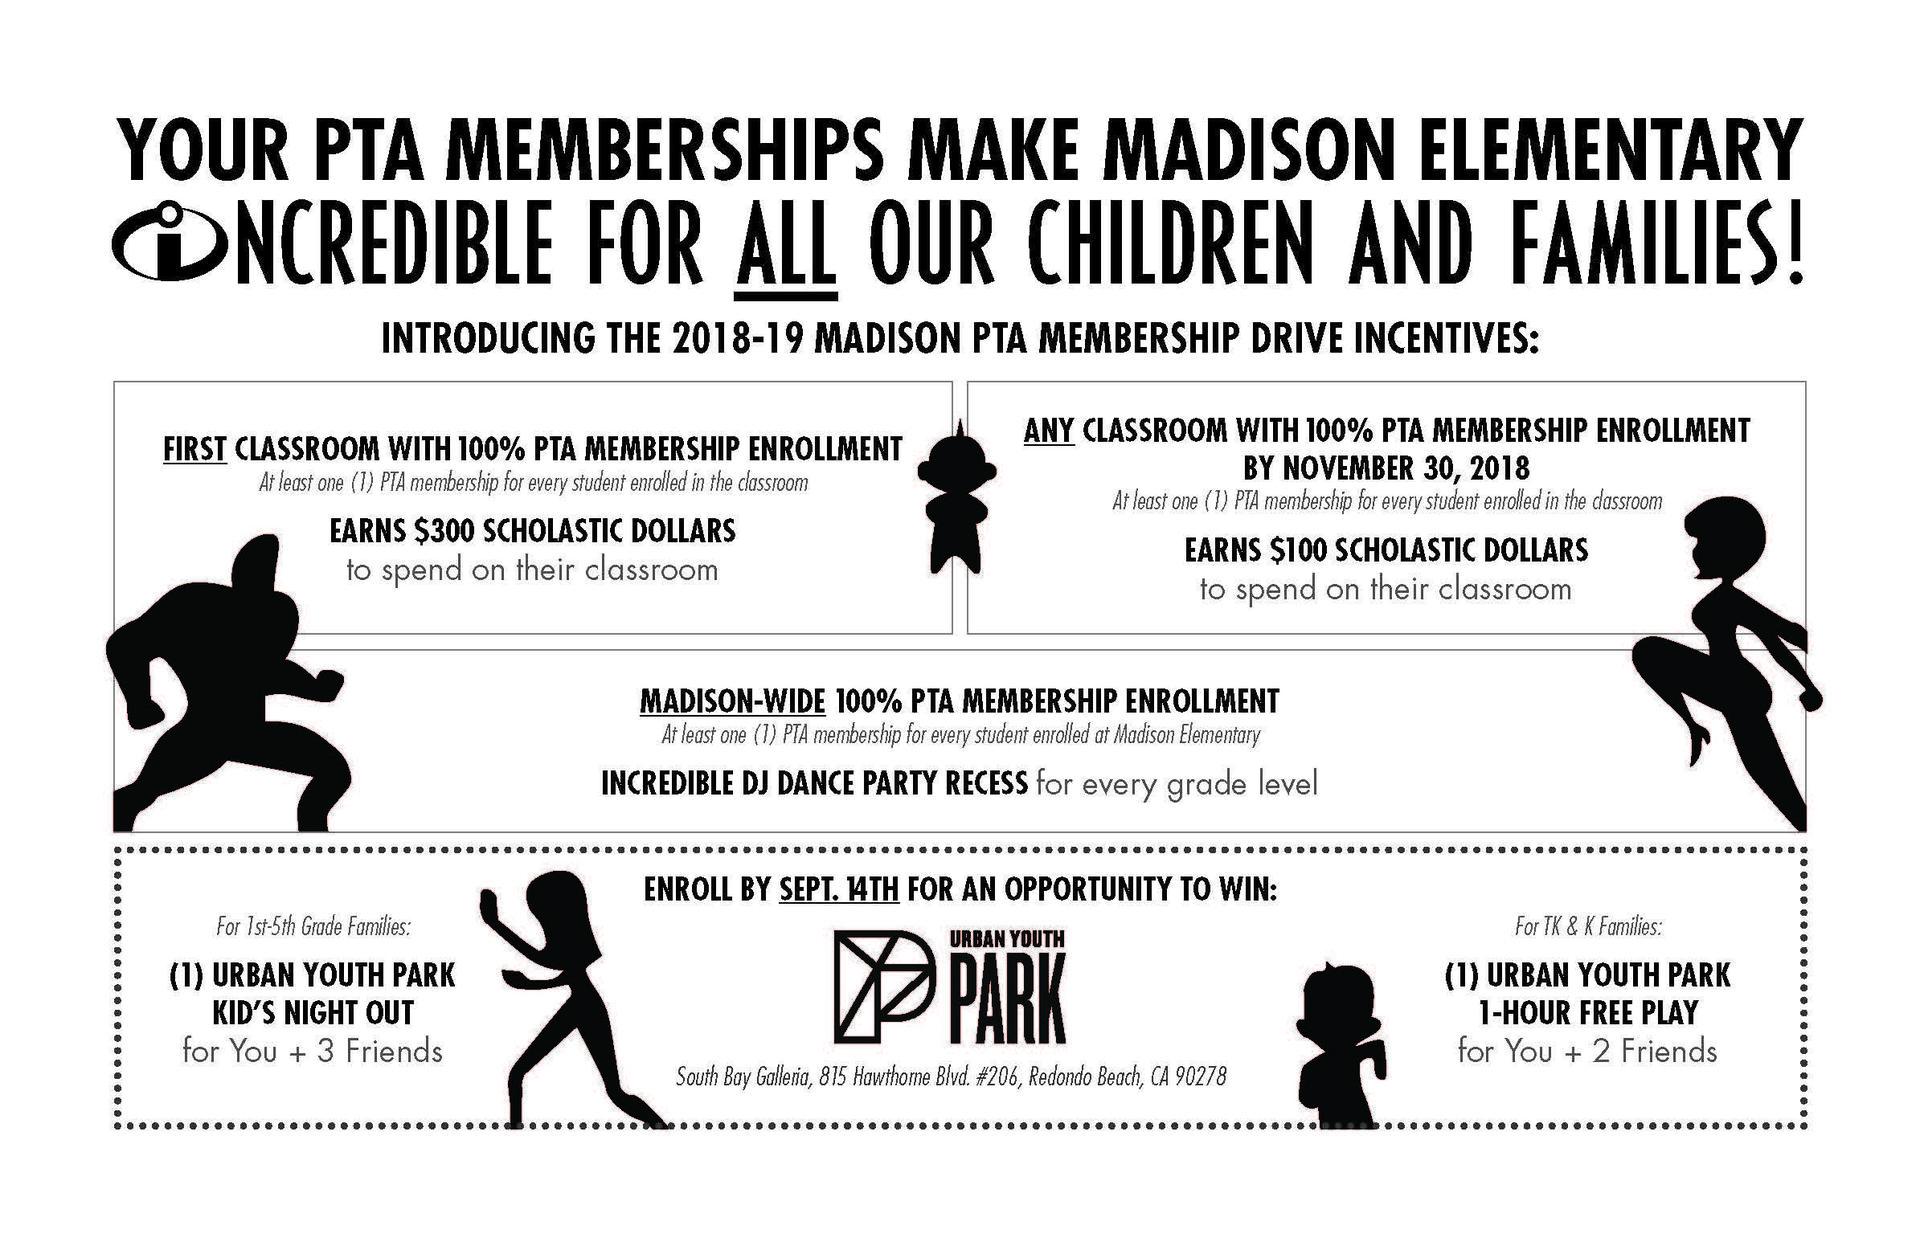 2018-19 PTA Membership Incentives